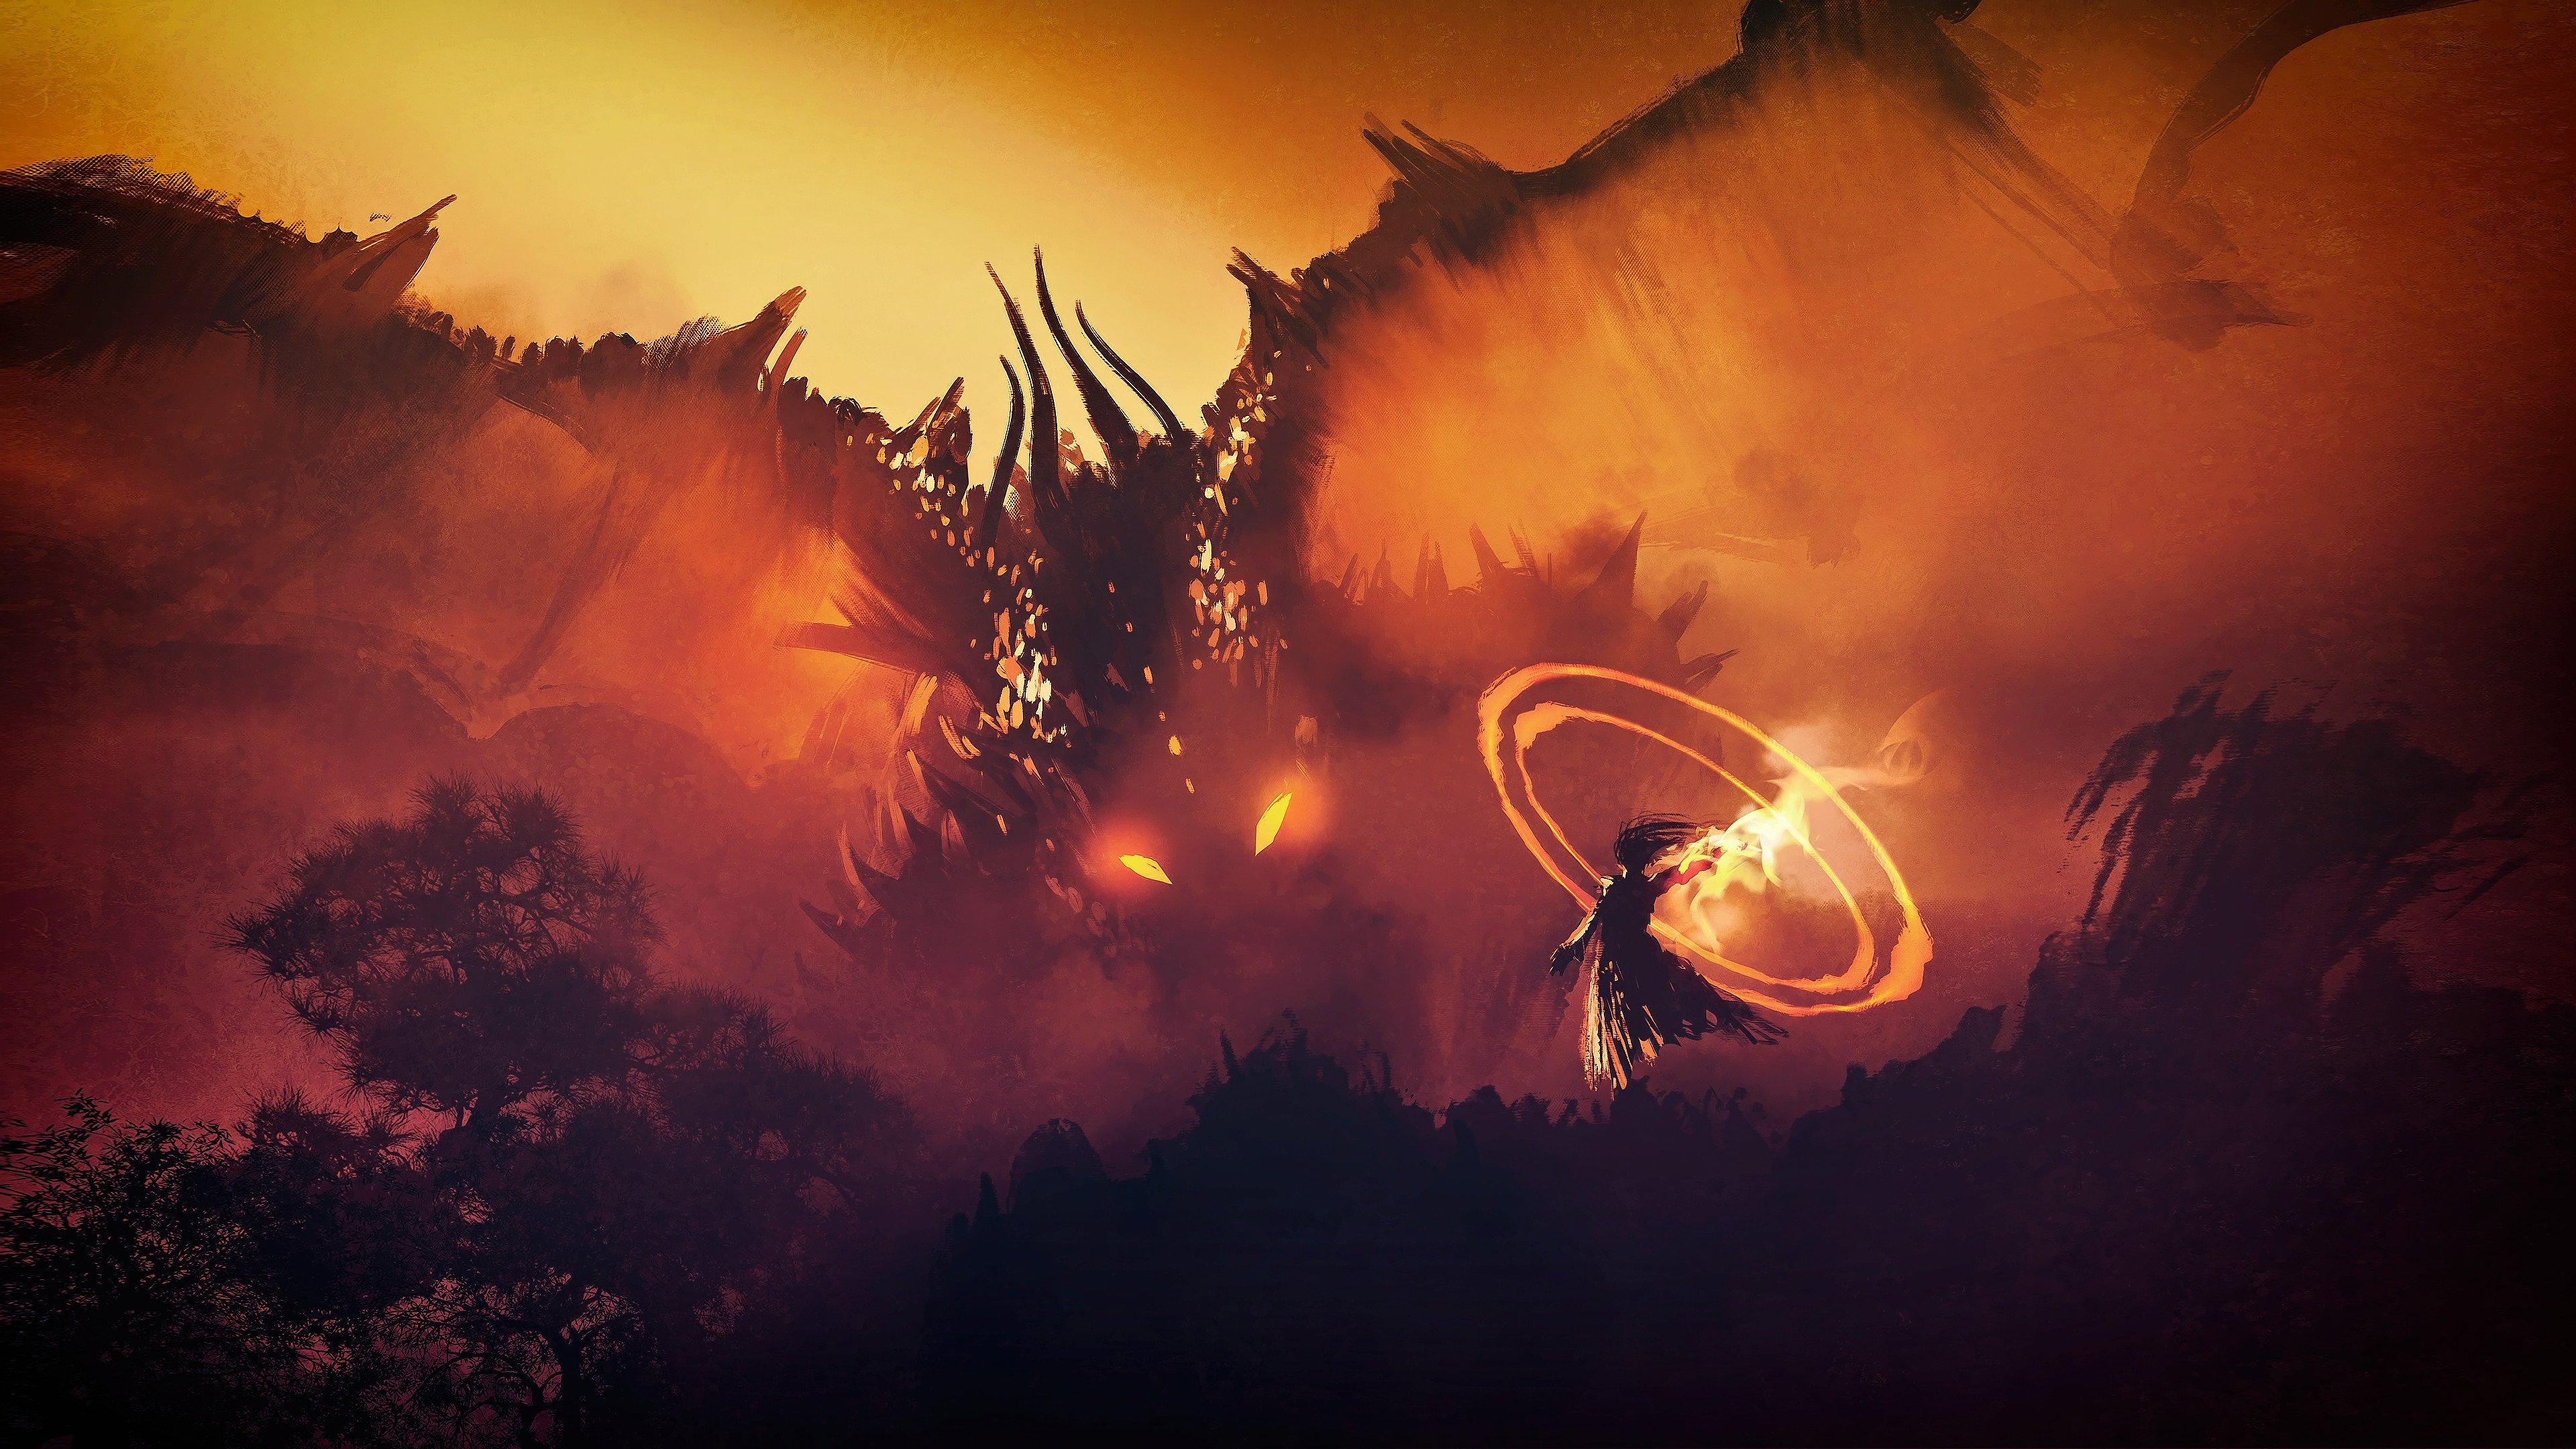 Wizard Vs Dragon wallpaper